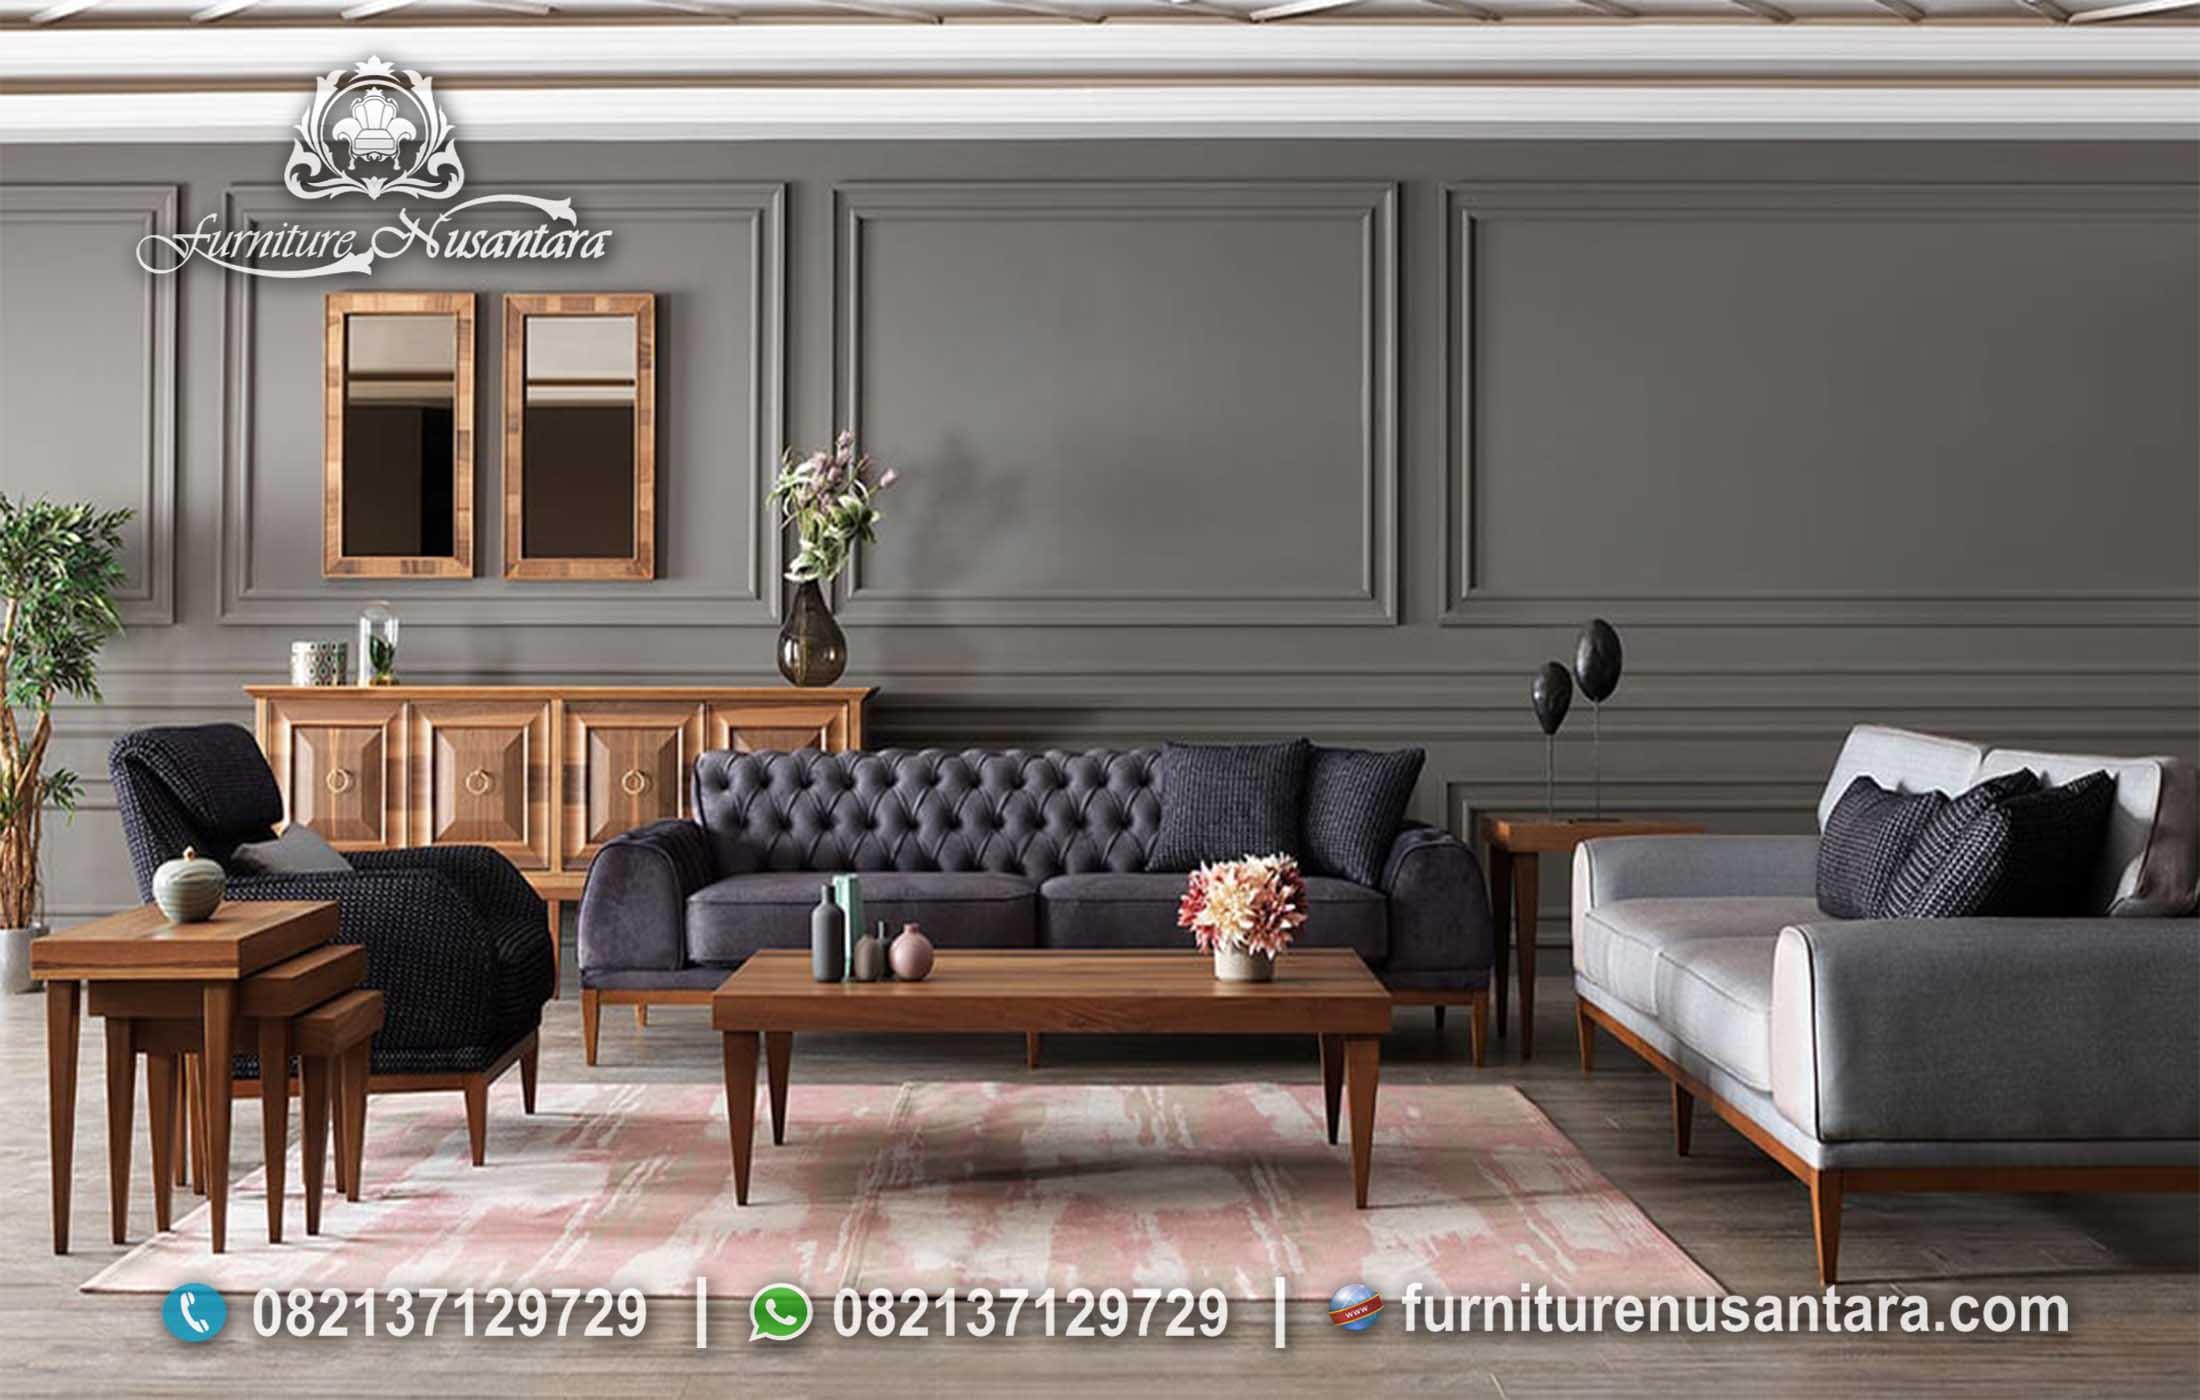 Jual Set Sofa Minimalis Kayu Stylist ST-66, Furniture Nusantara